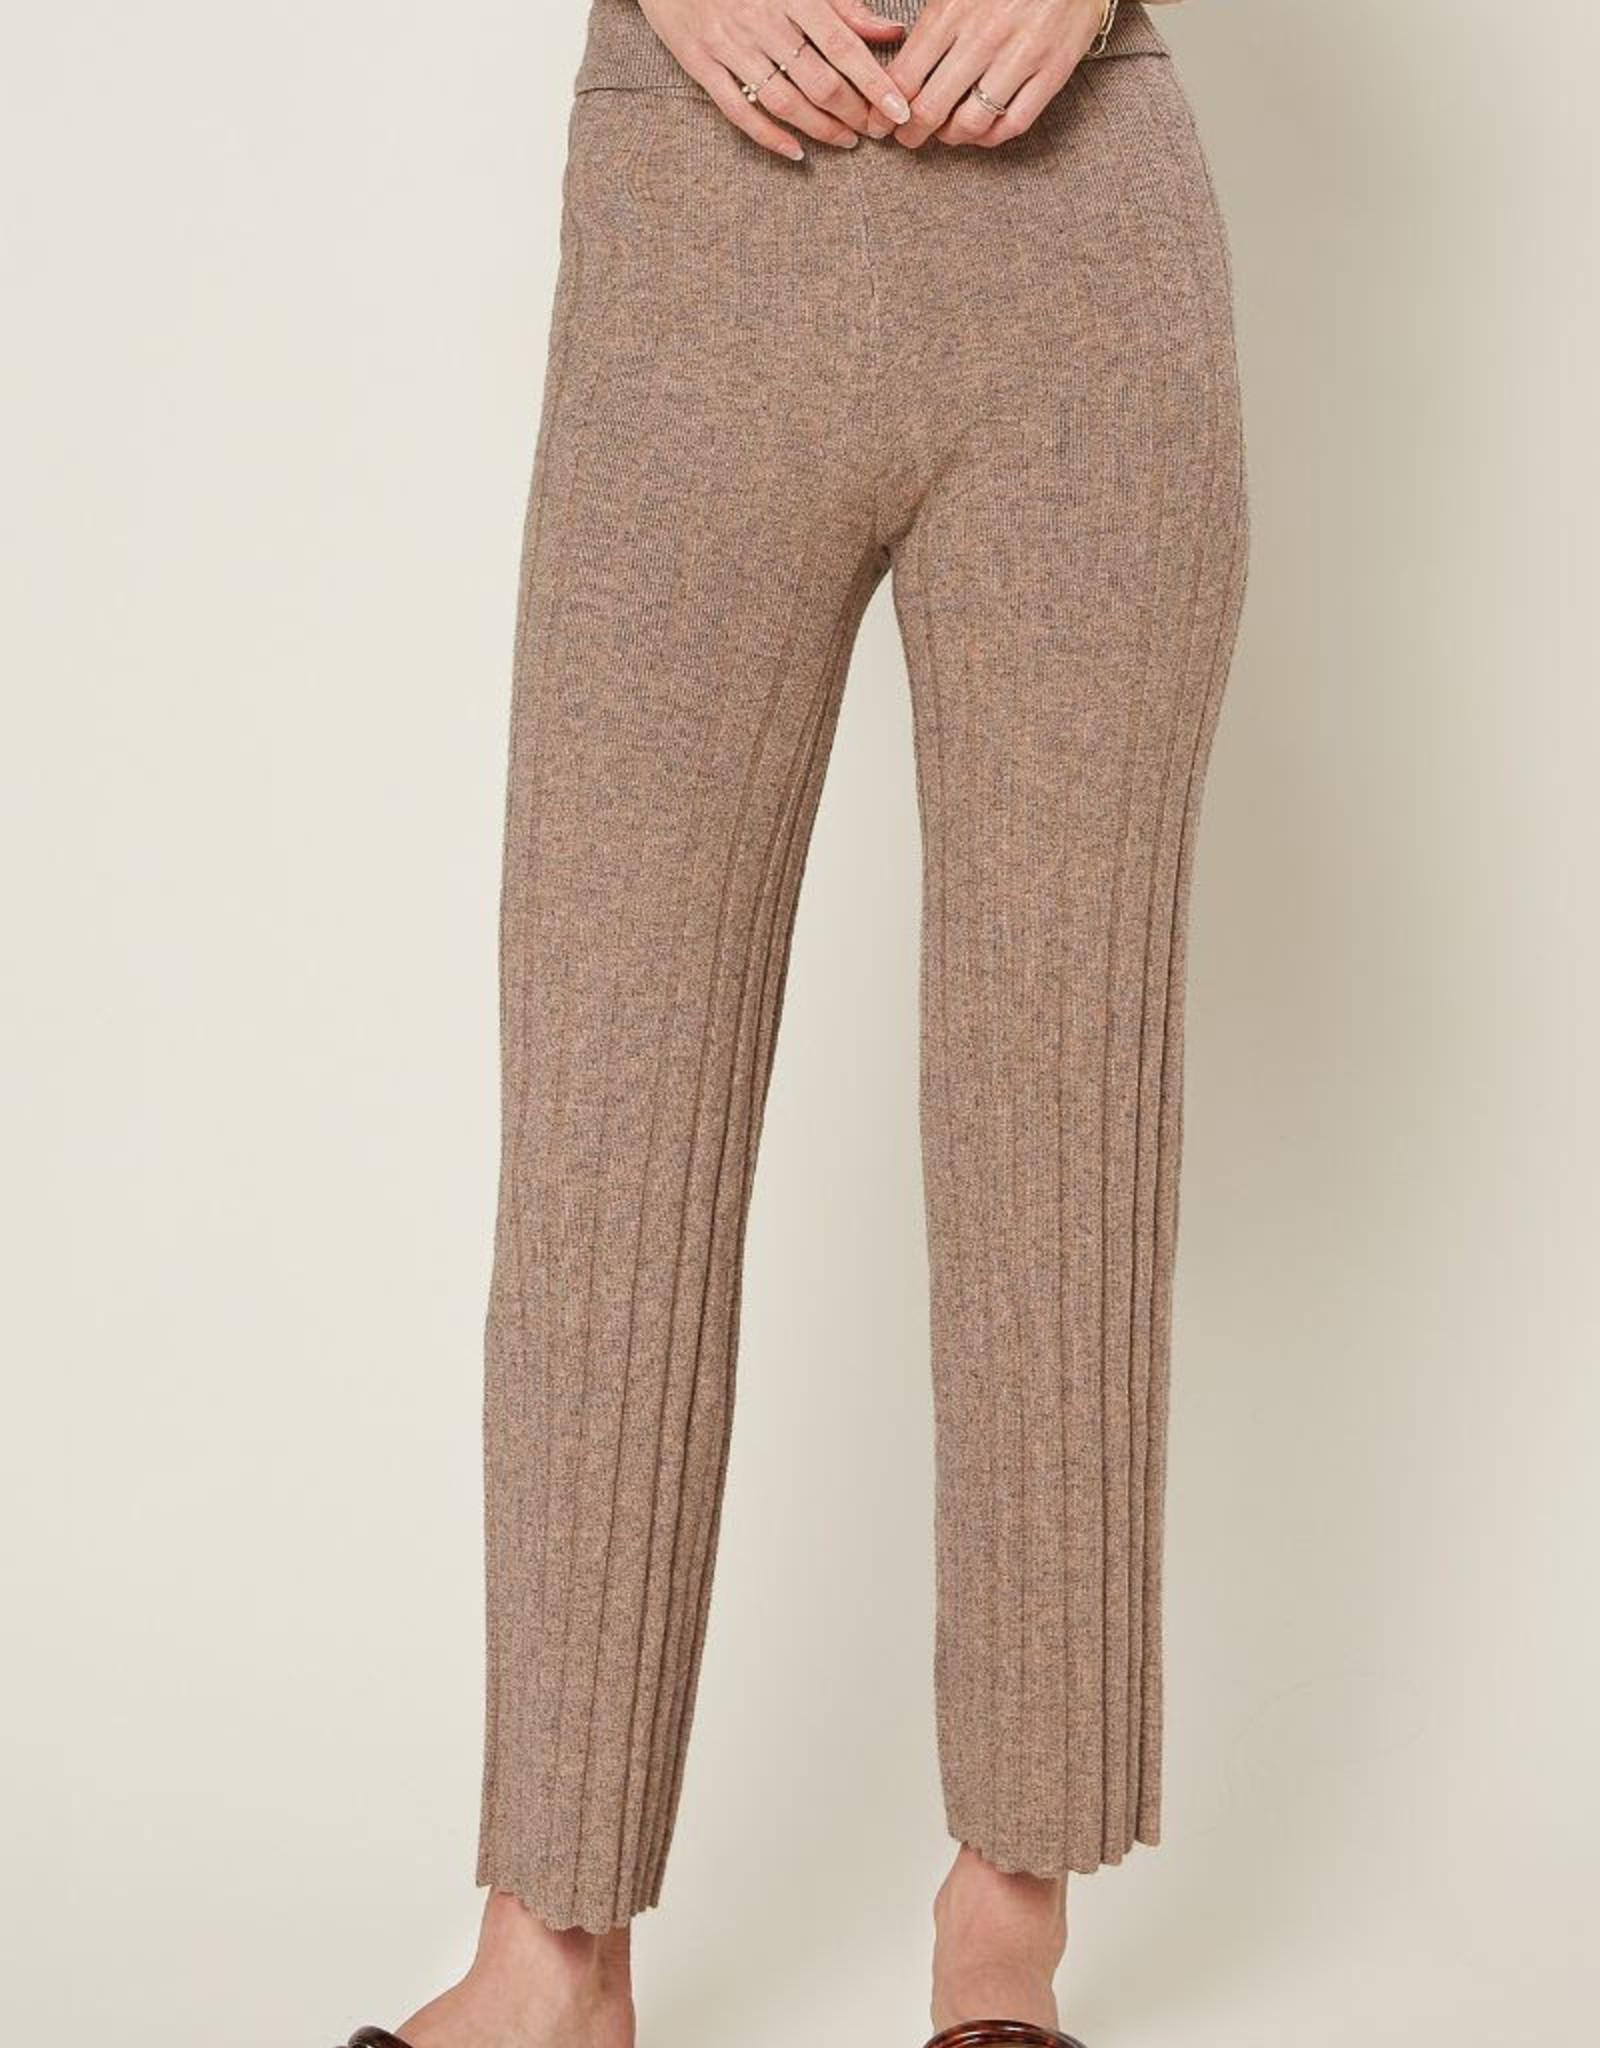 Current Air 2070248 Melange Flared Ribbed Knit Pants